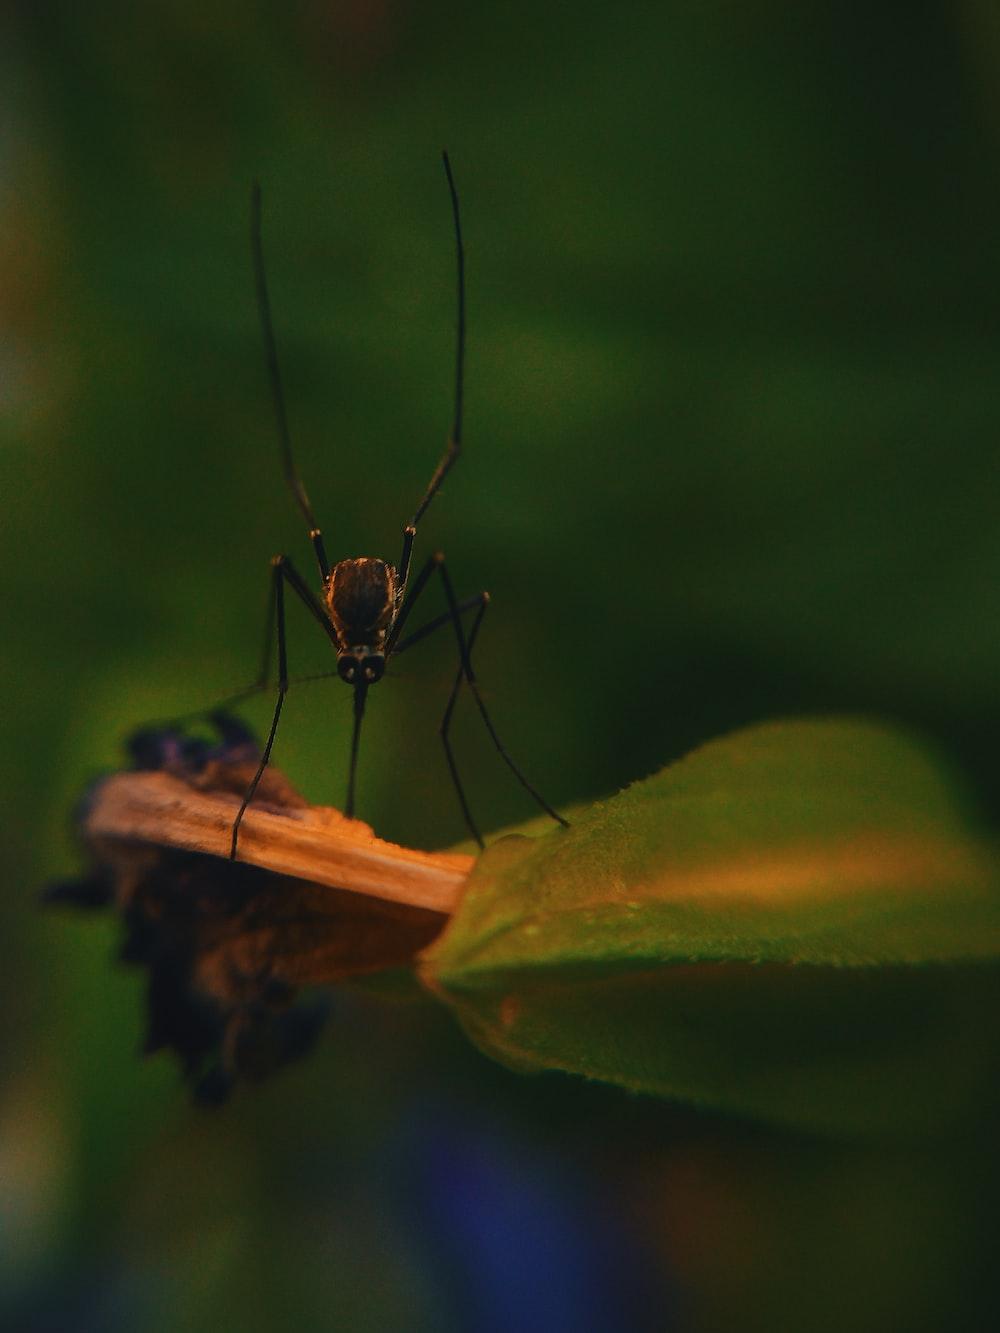 macro photography of mosquito